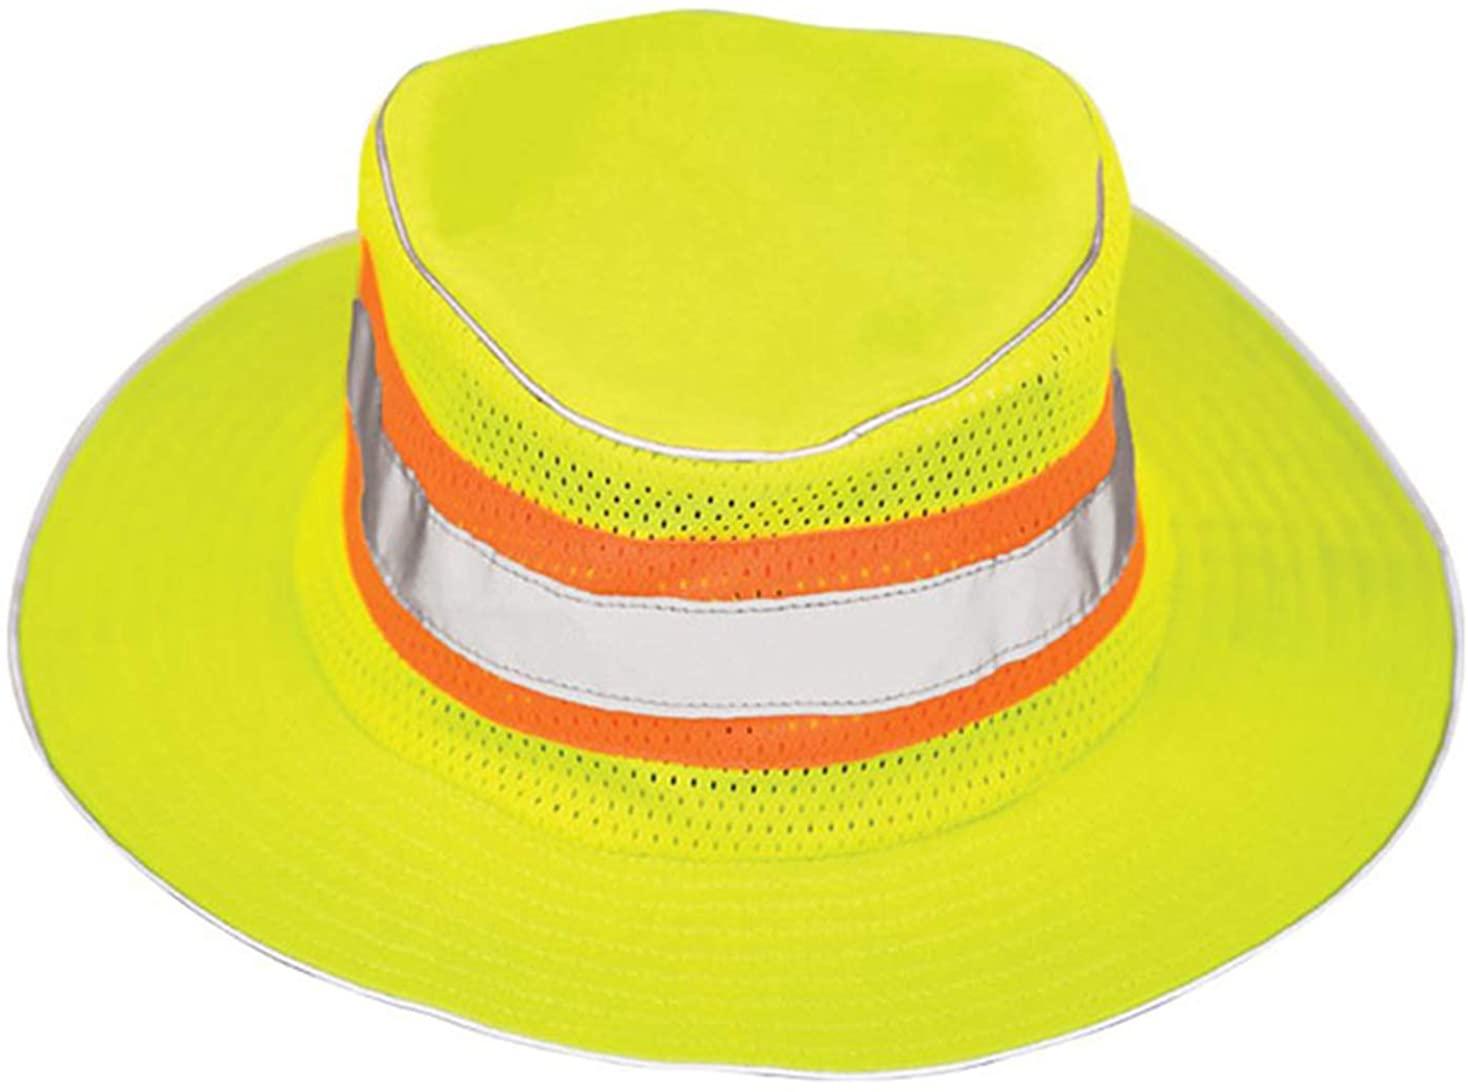 TOP HEADWEAR Reflective Full Brim Safari Hat